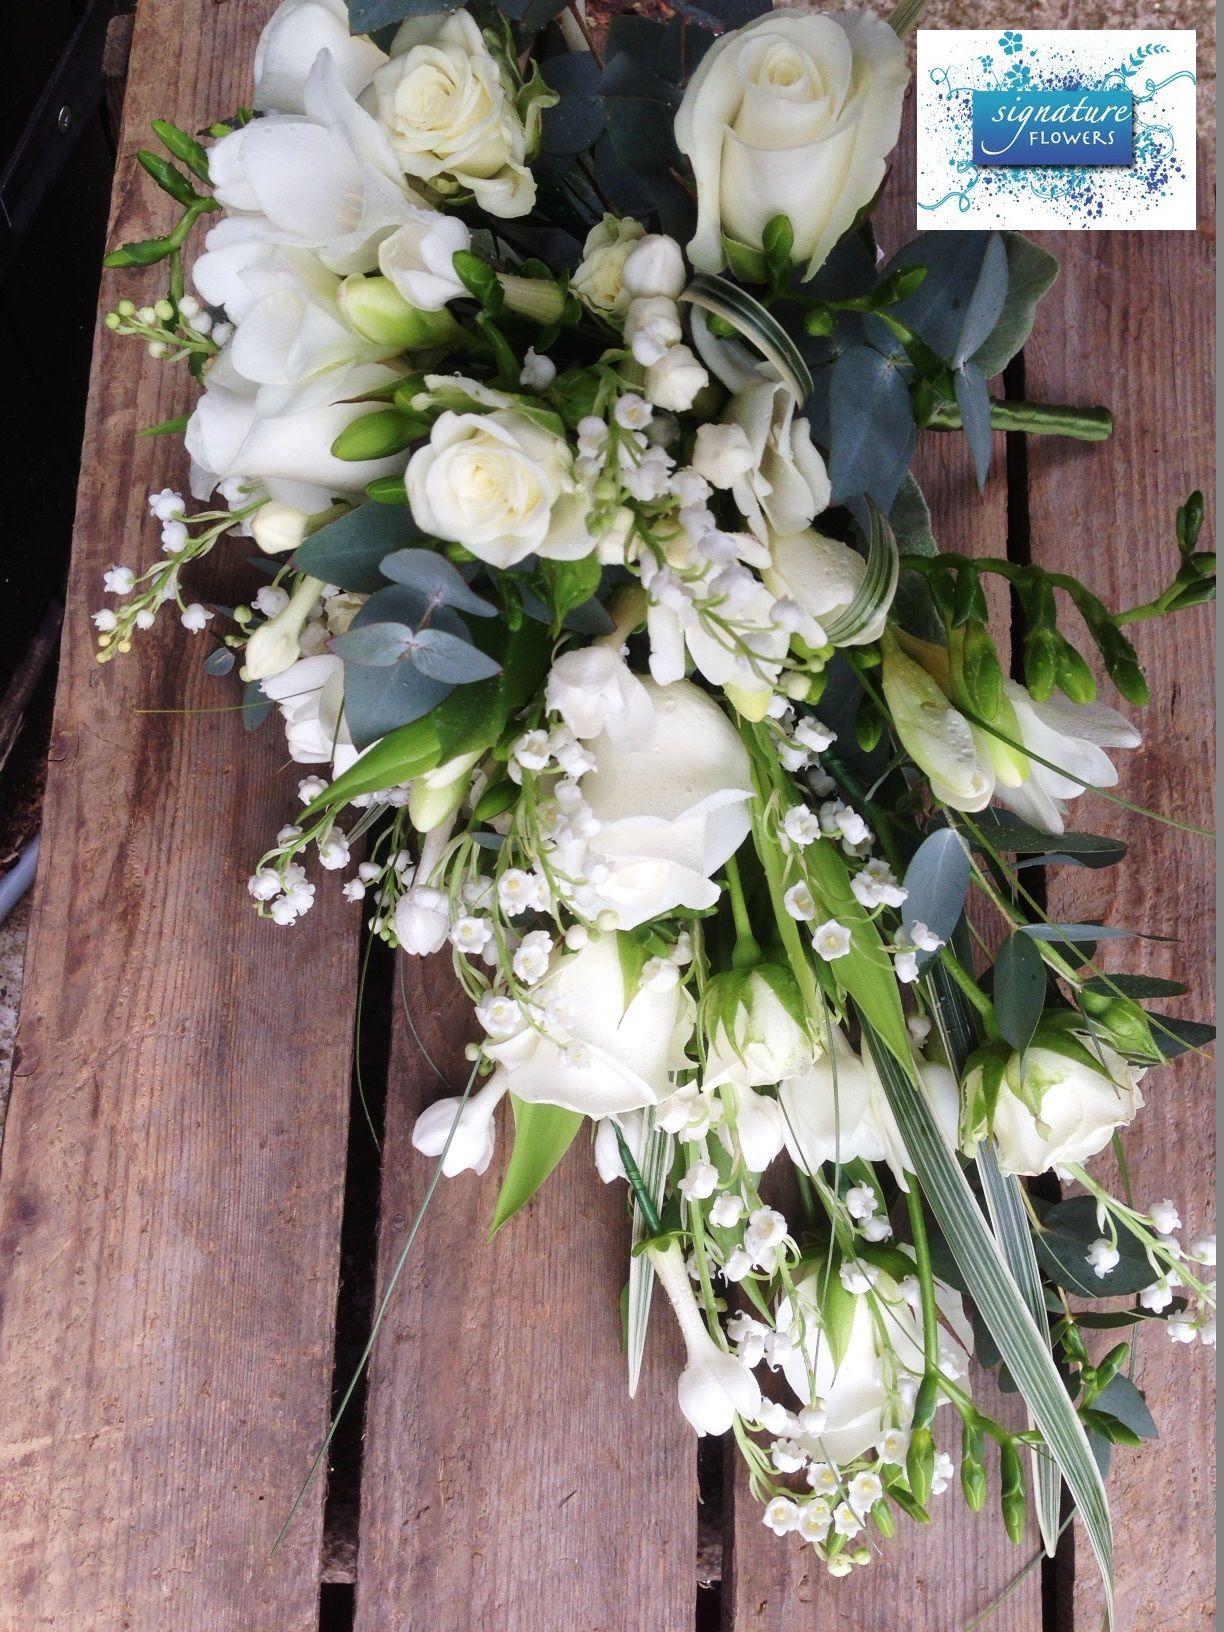 Lily Of The Valley Roses Freesia Stephanotis White Bridal Shower